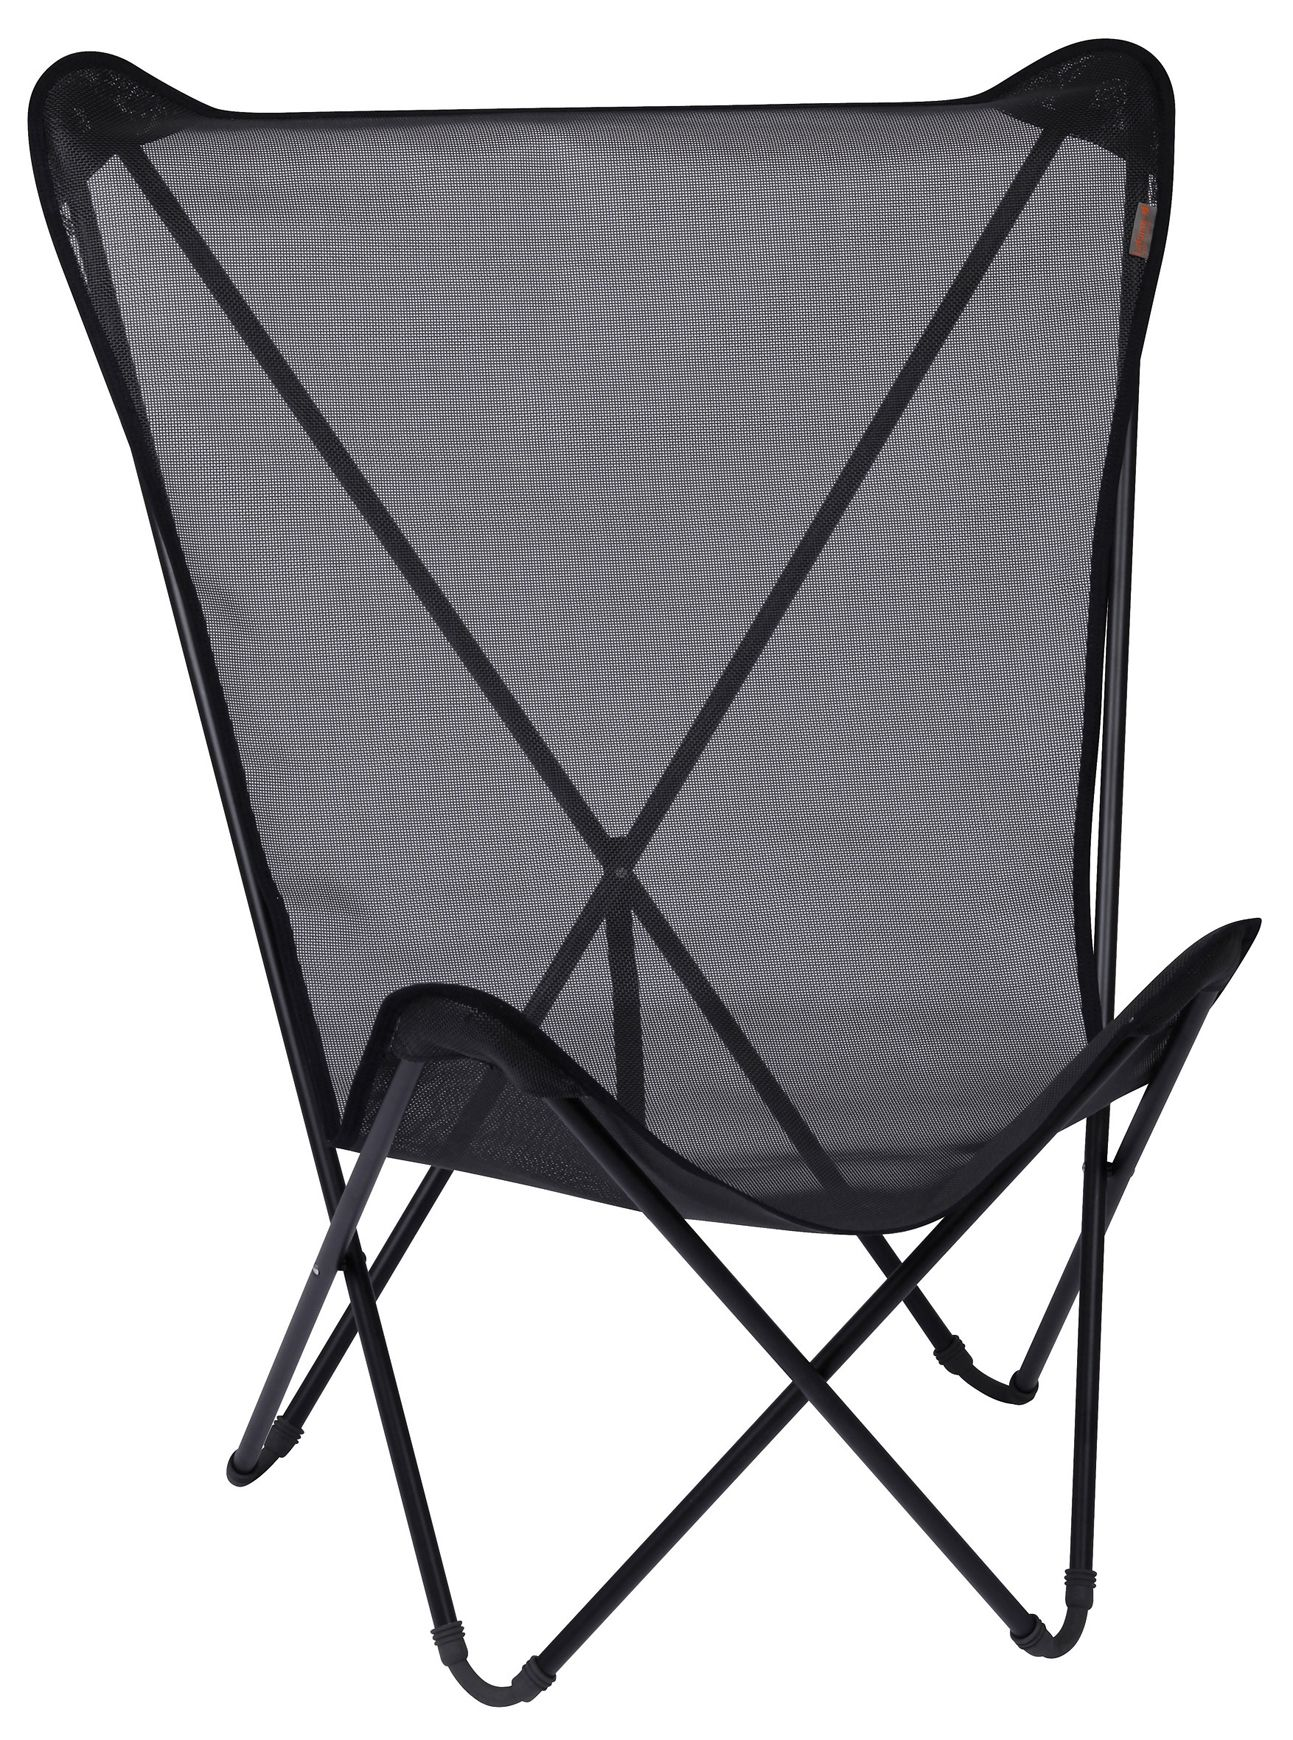 lafuma pop up chairs oversized adirondack maxi fun black tube noir mobilier